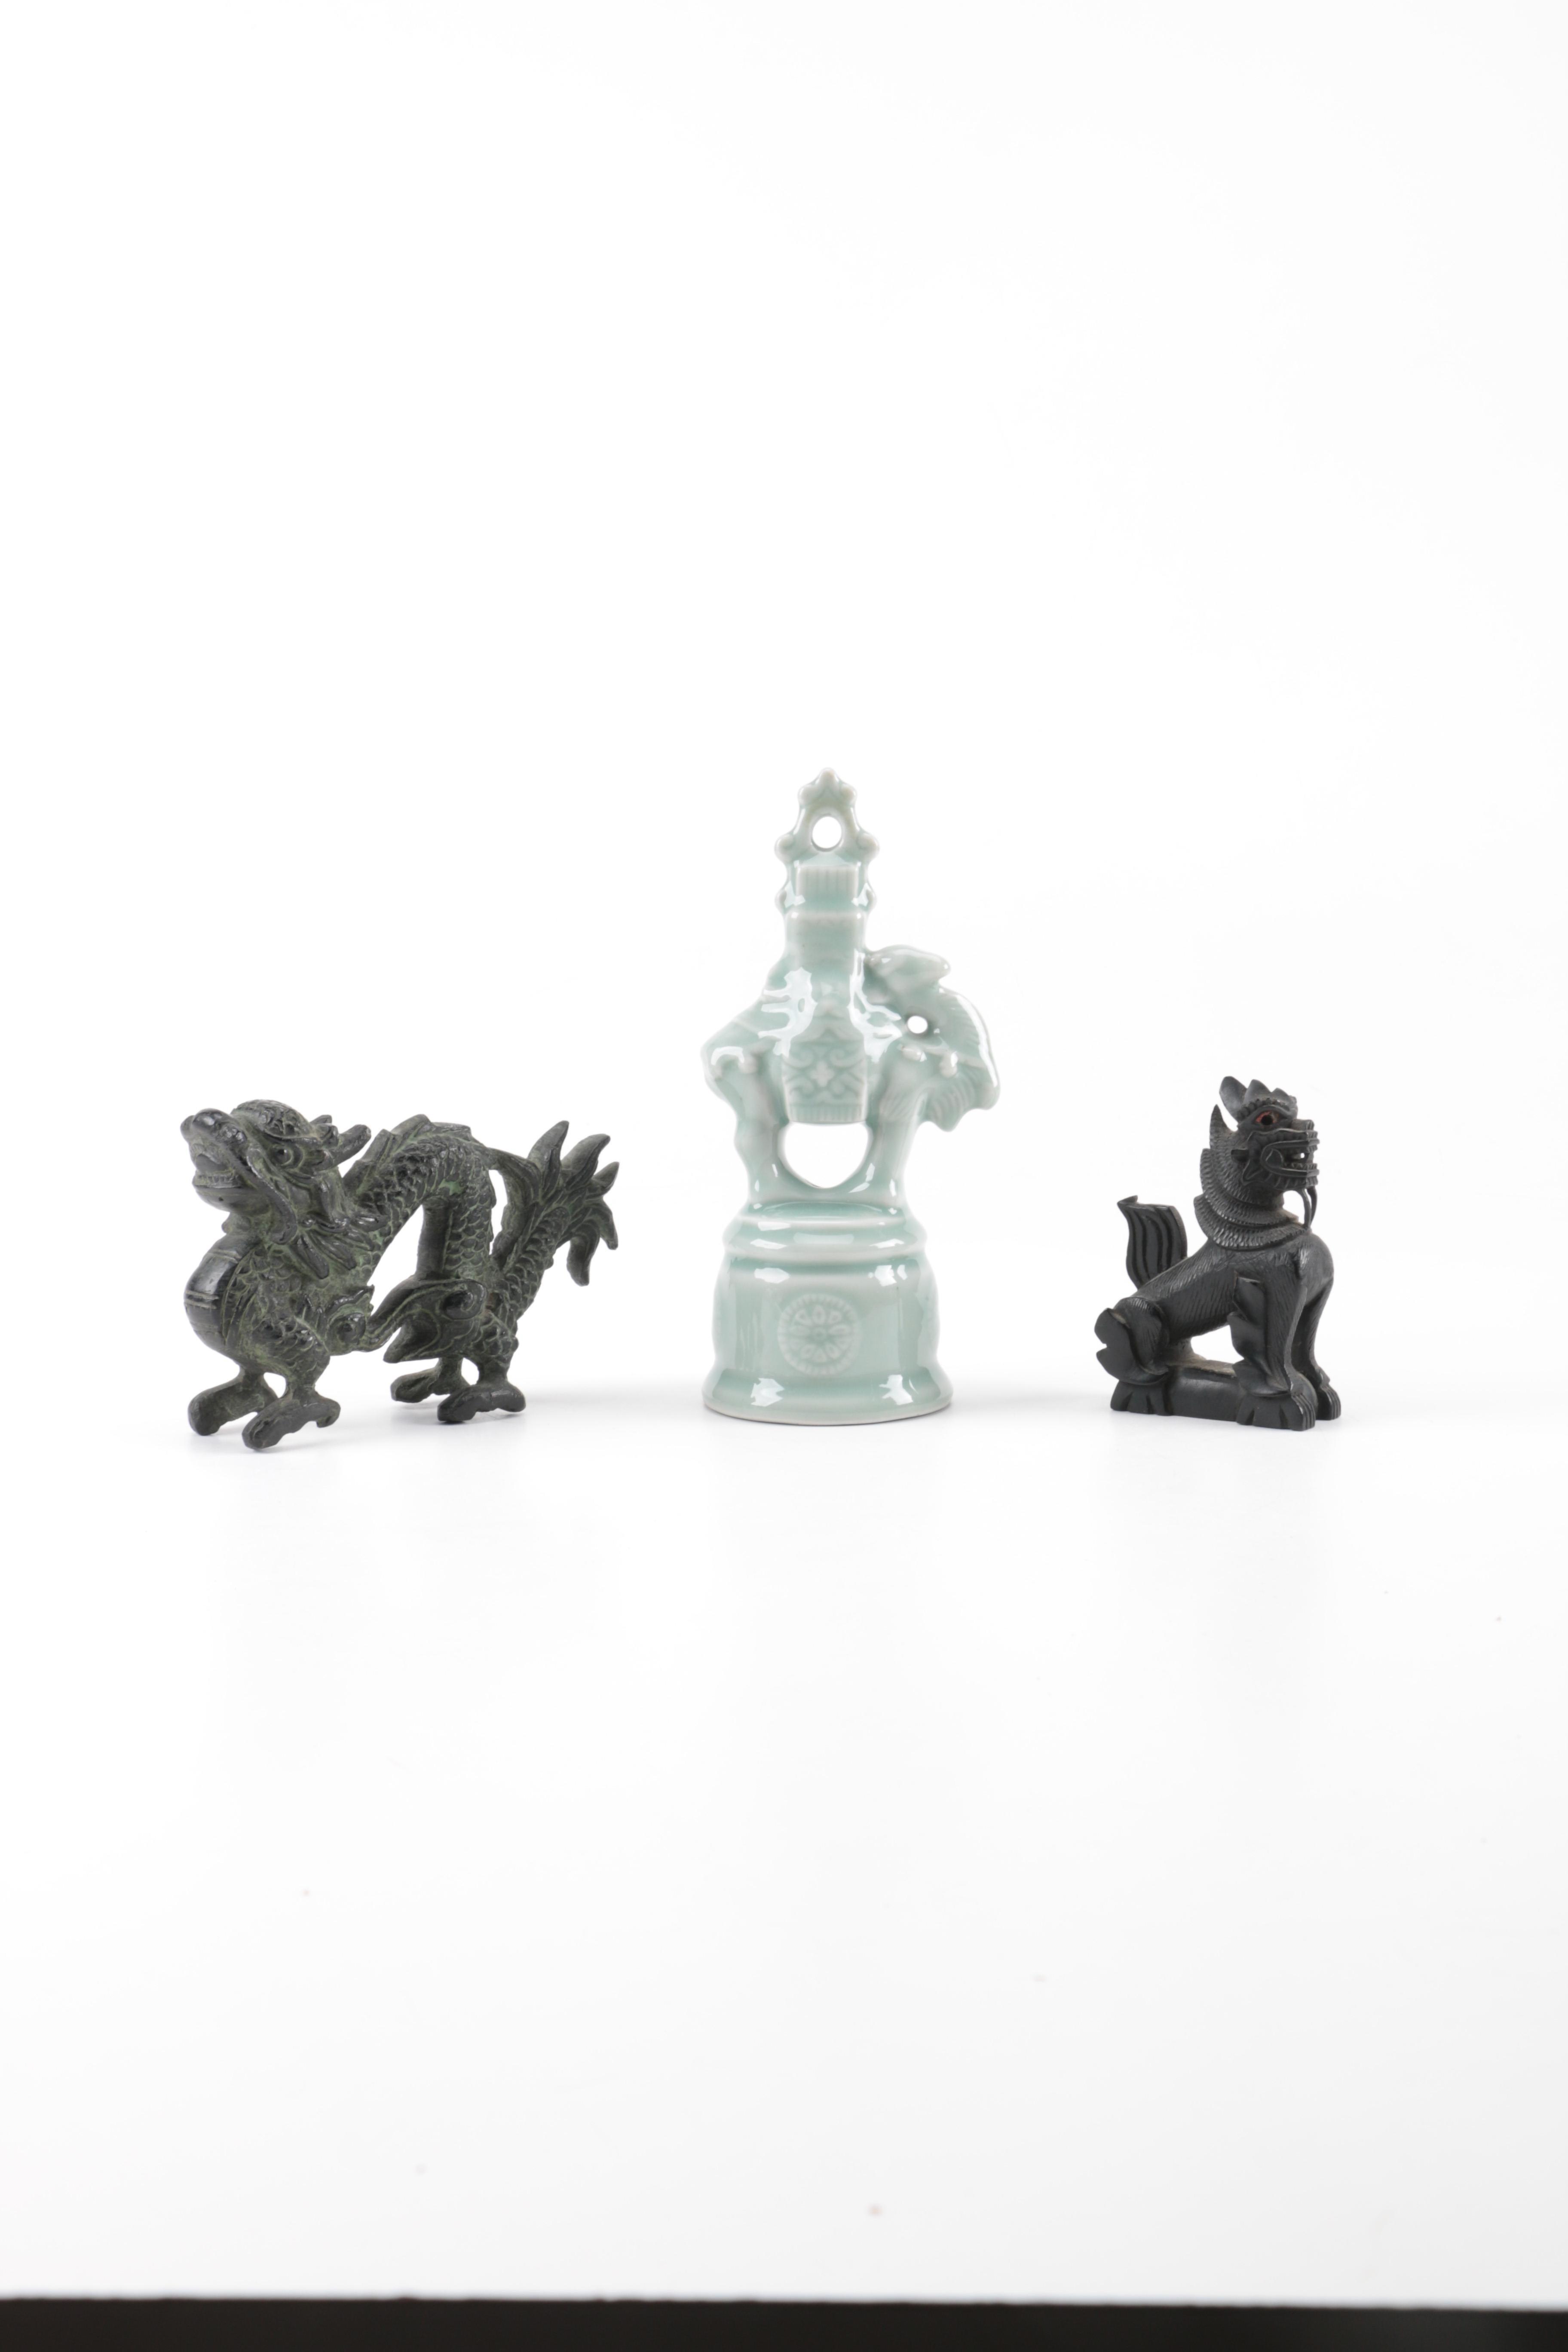 Assorted Dragon Figurines